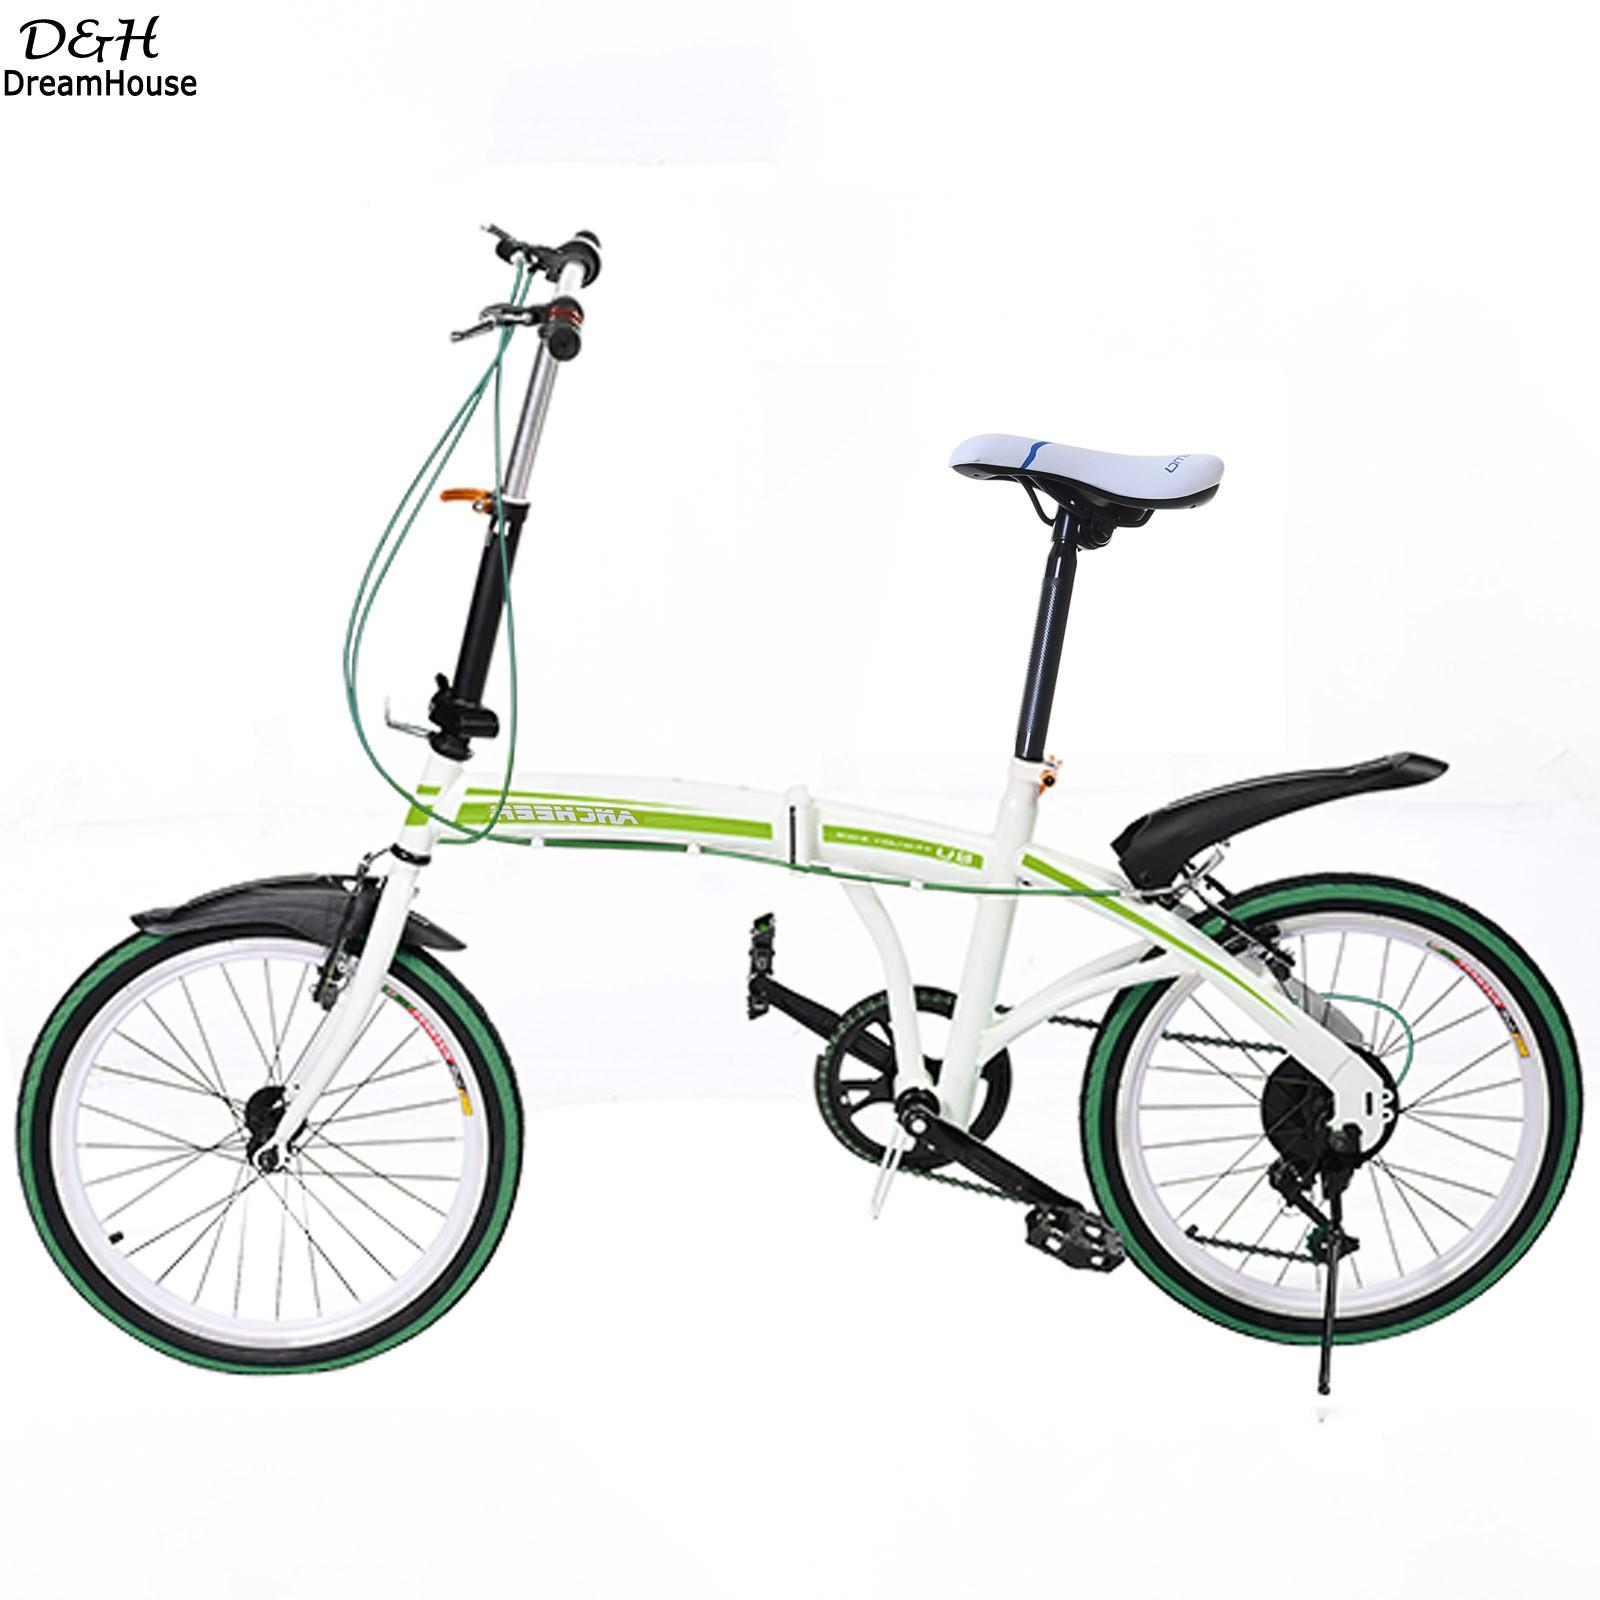 Brand 6-Speed Disc Brake Practical Portable Folding Bike Bicycle Unisex Adult Bicycles Green Travel Vehicles Bicicleta Plegable(China (Mainland))